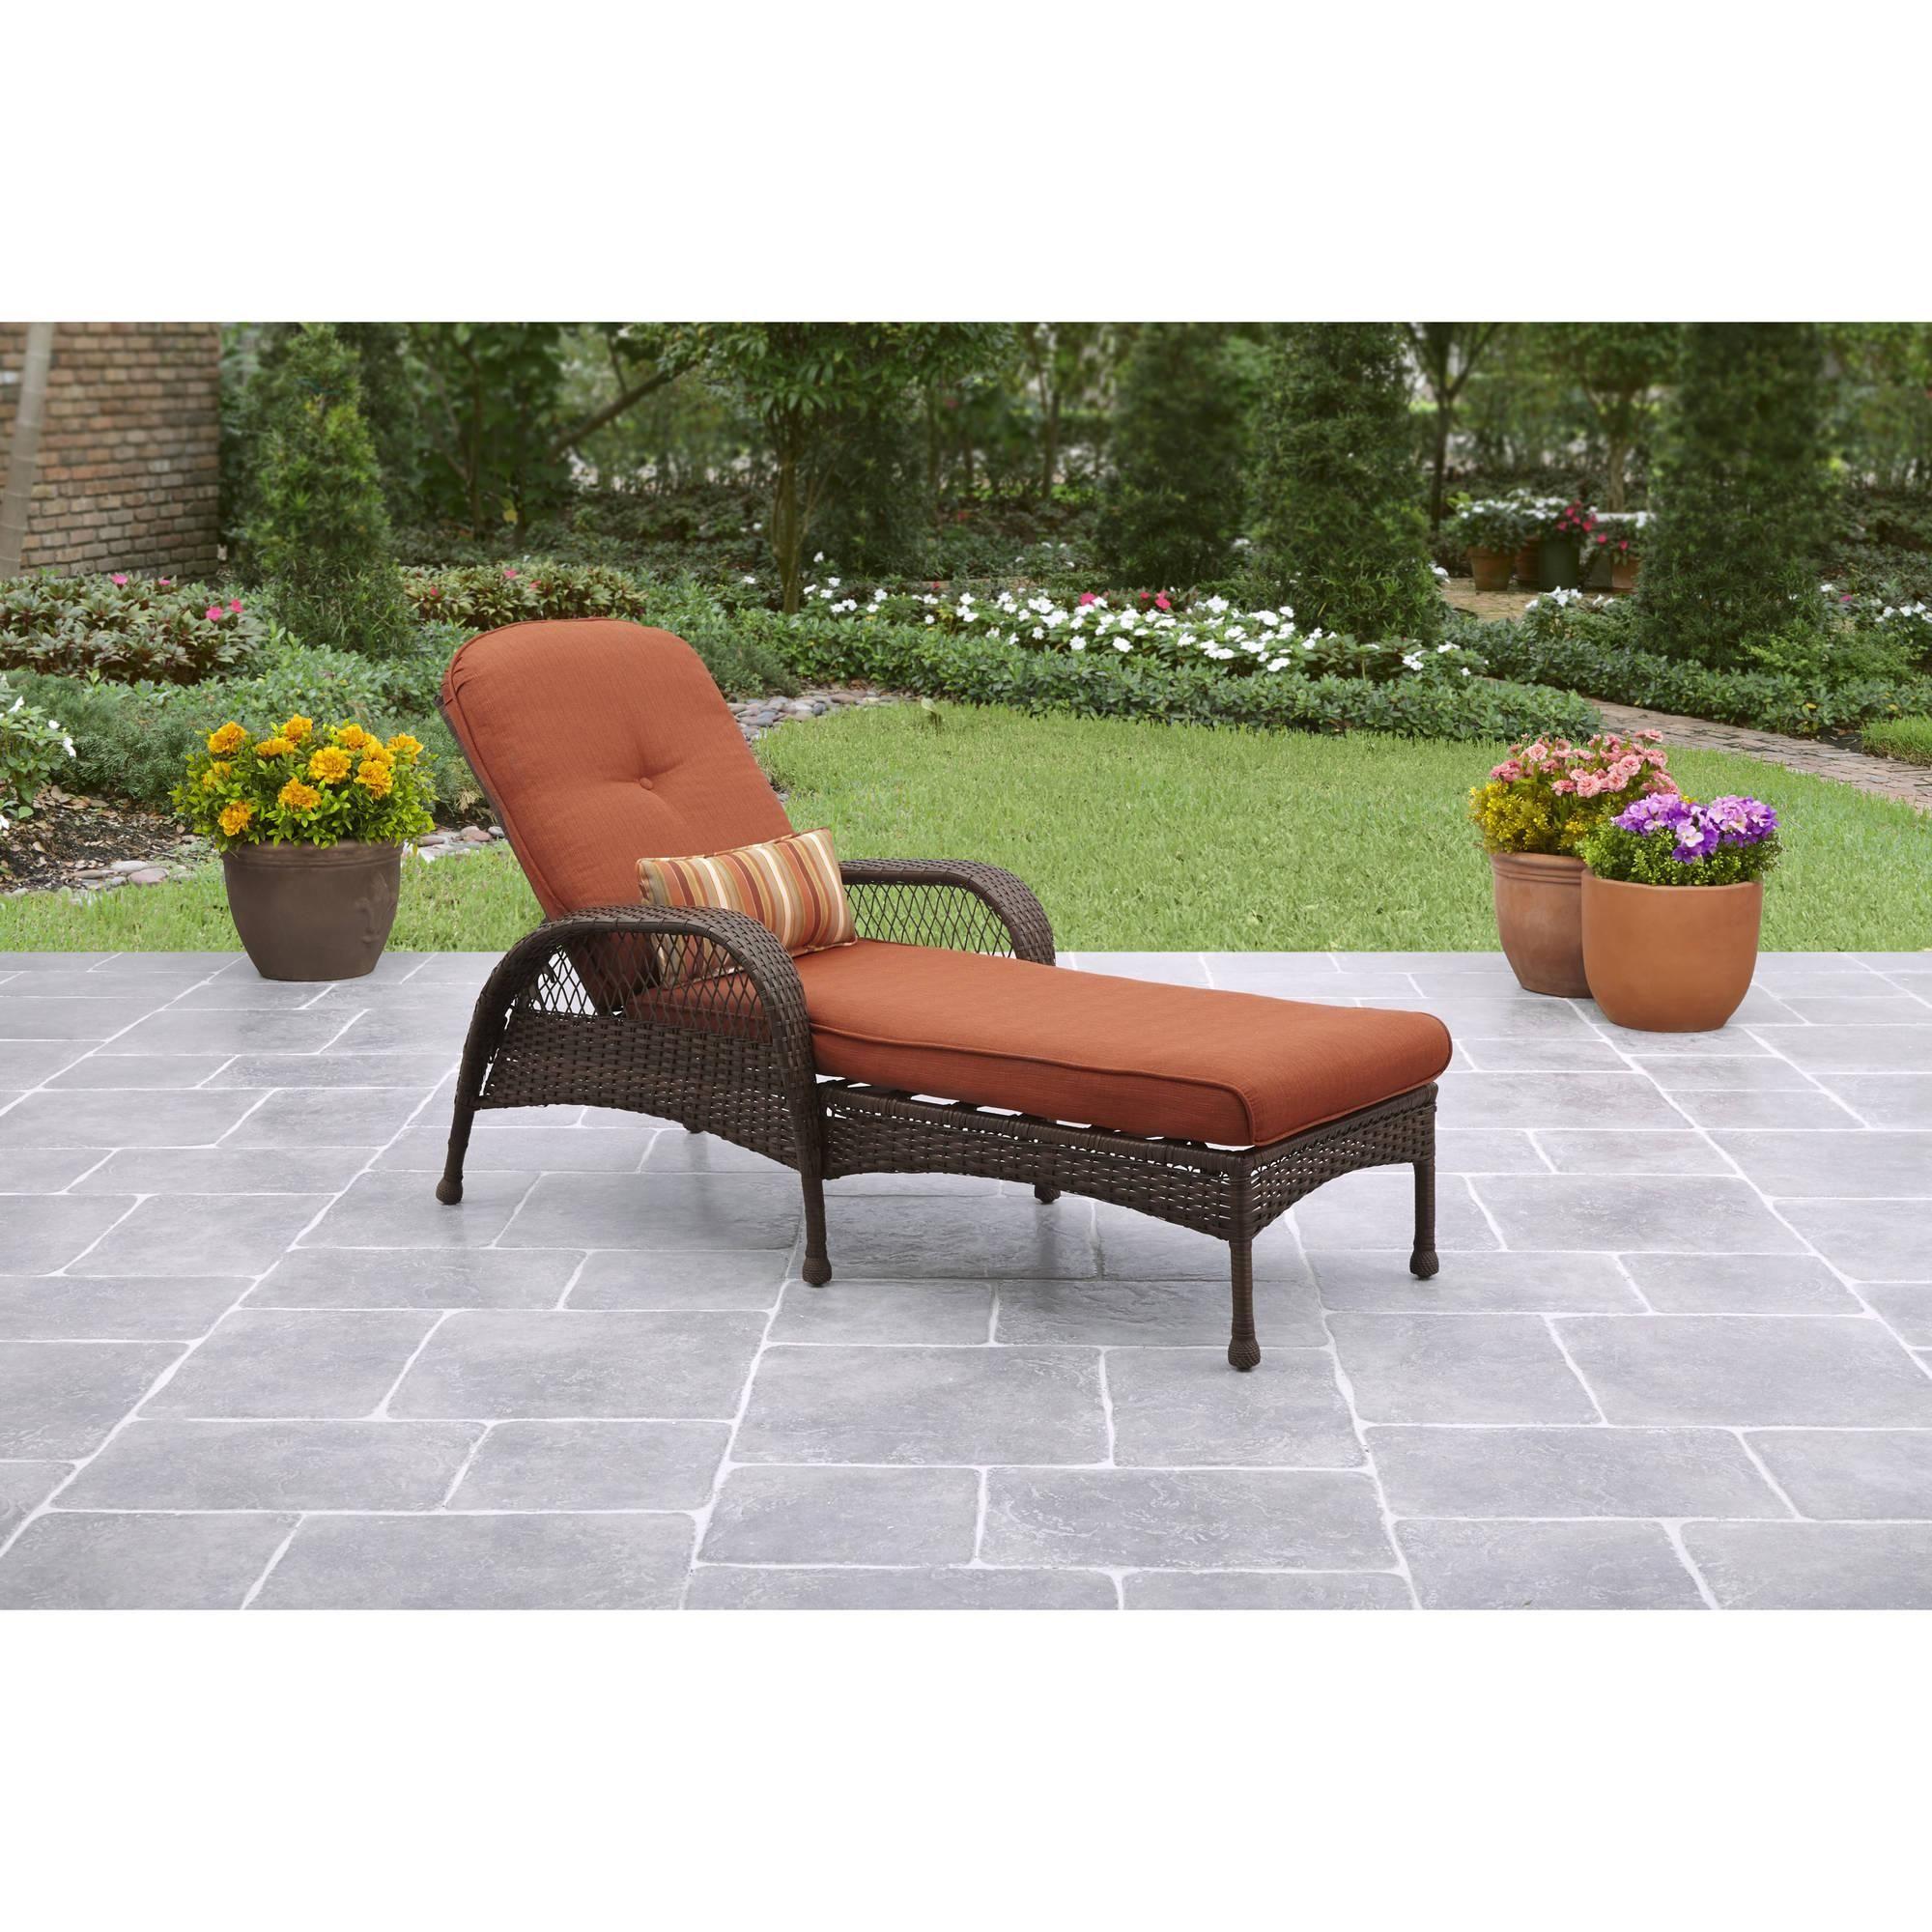 Patio & Garden Patio chaise lounge, Better homes, gardens